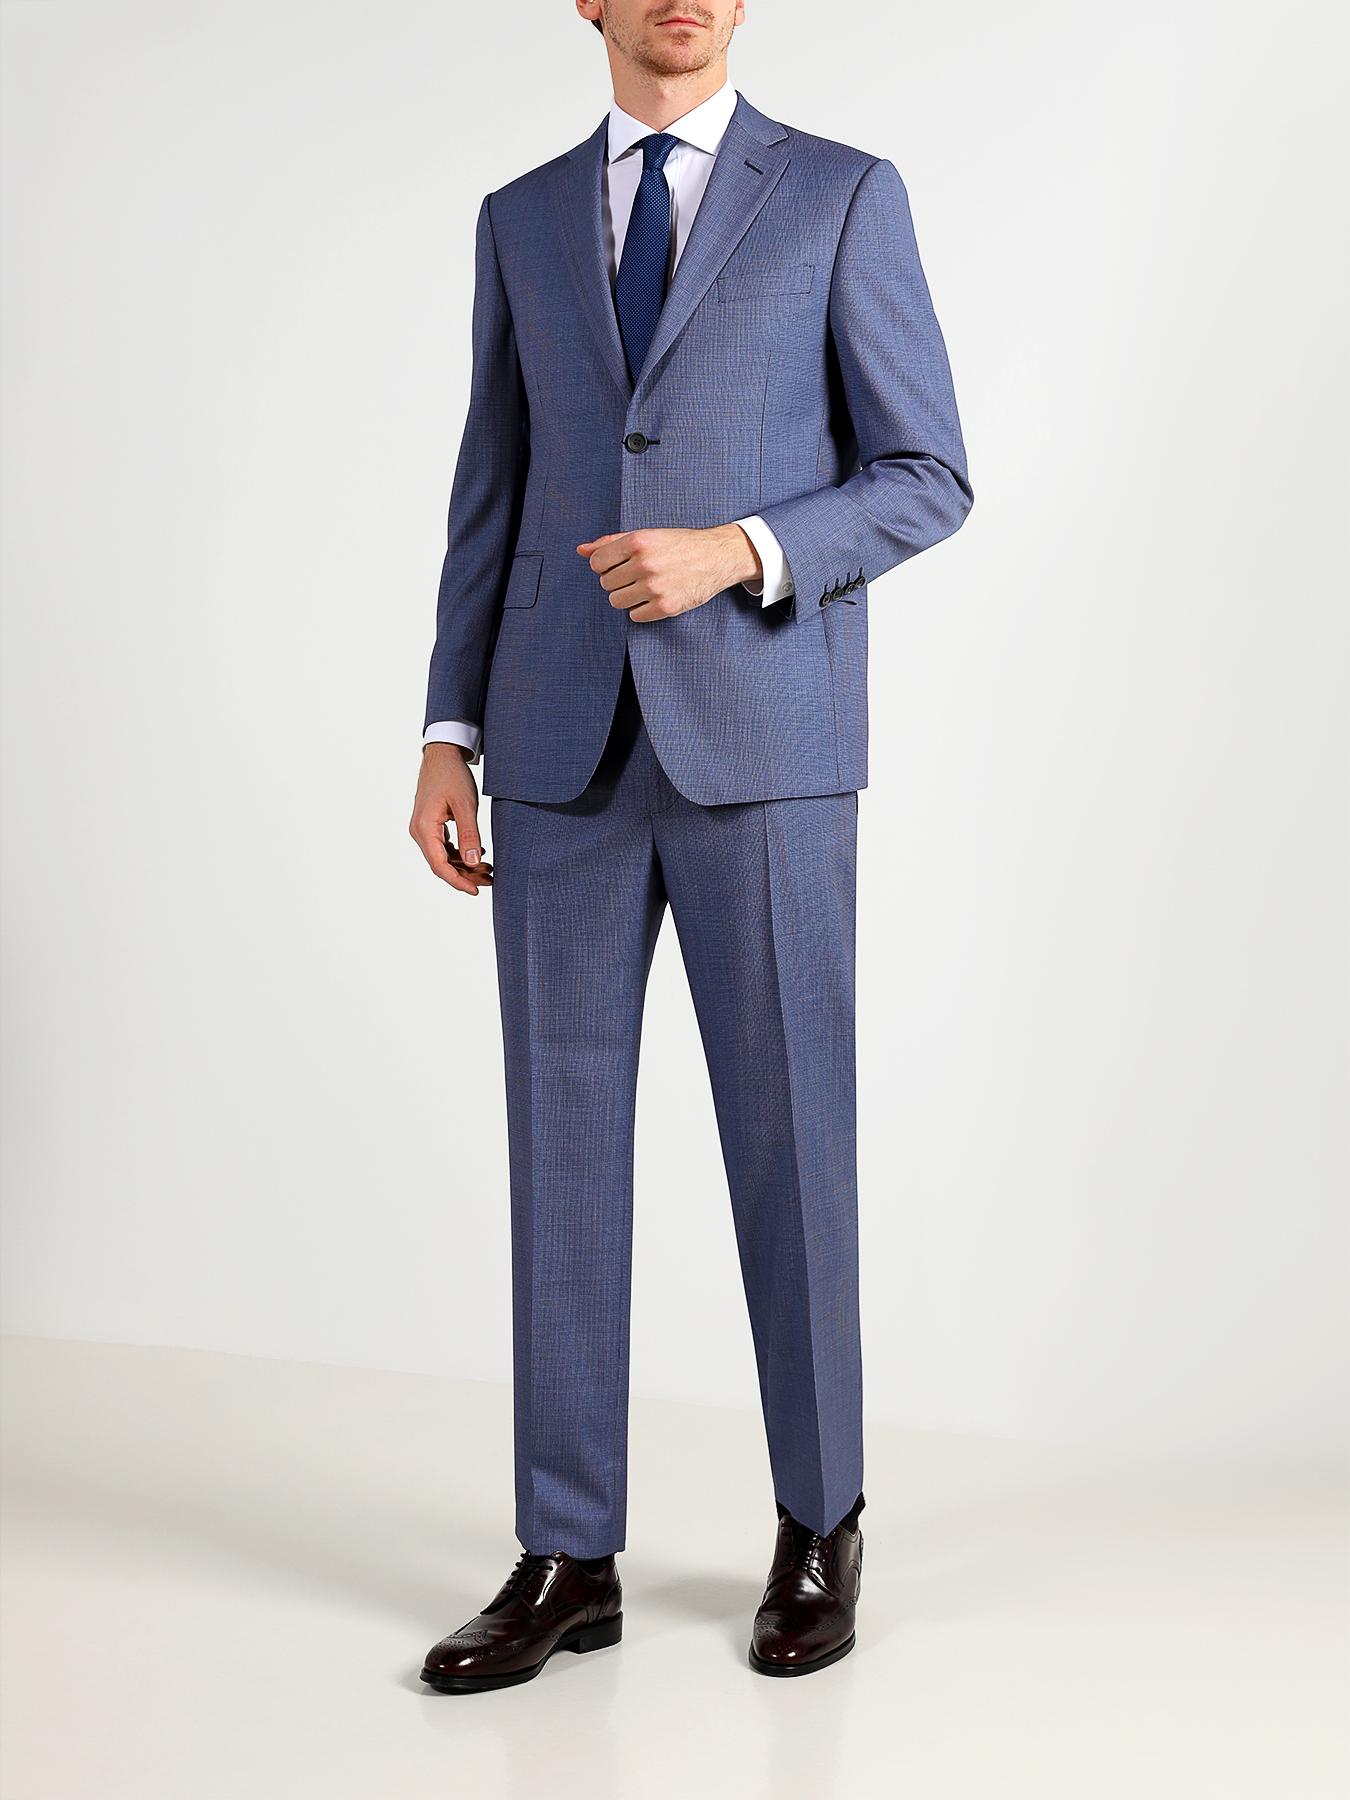 Ritter Классический костюм из шерсти